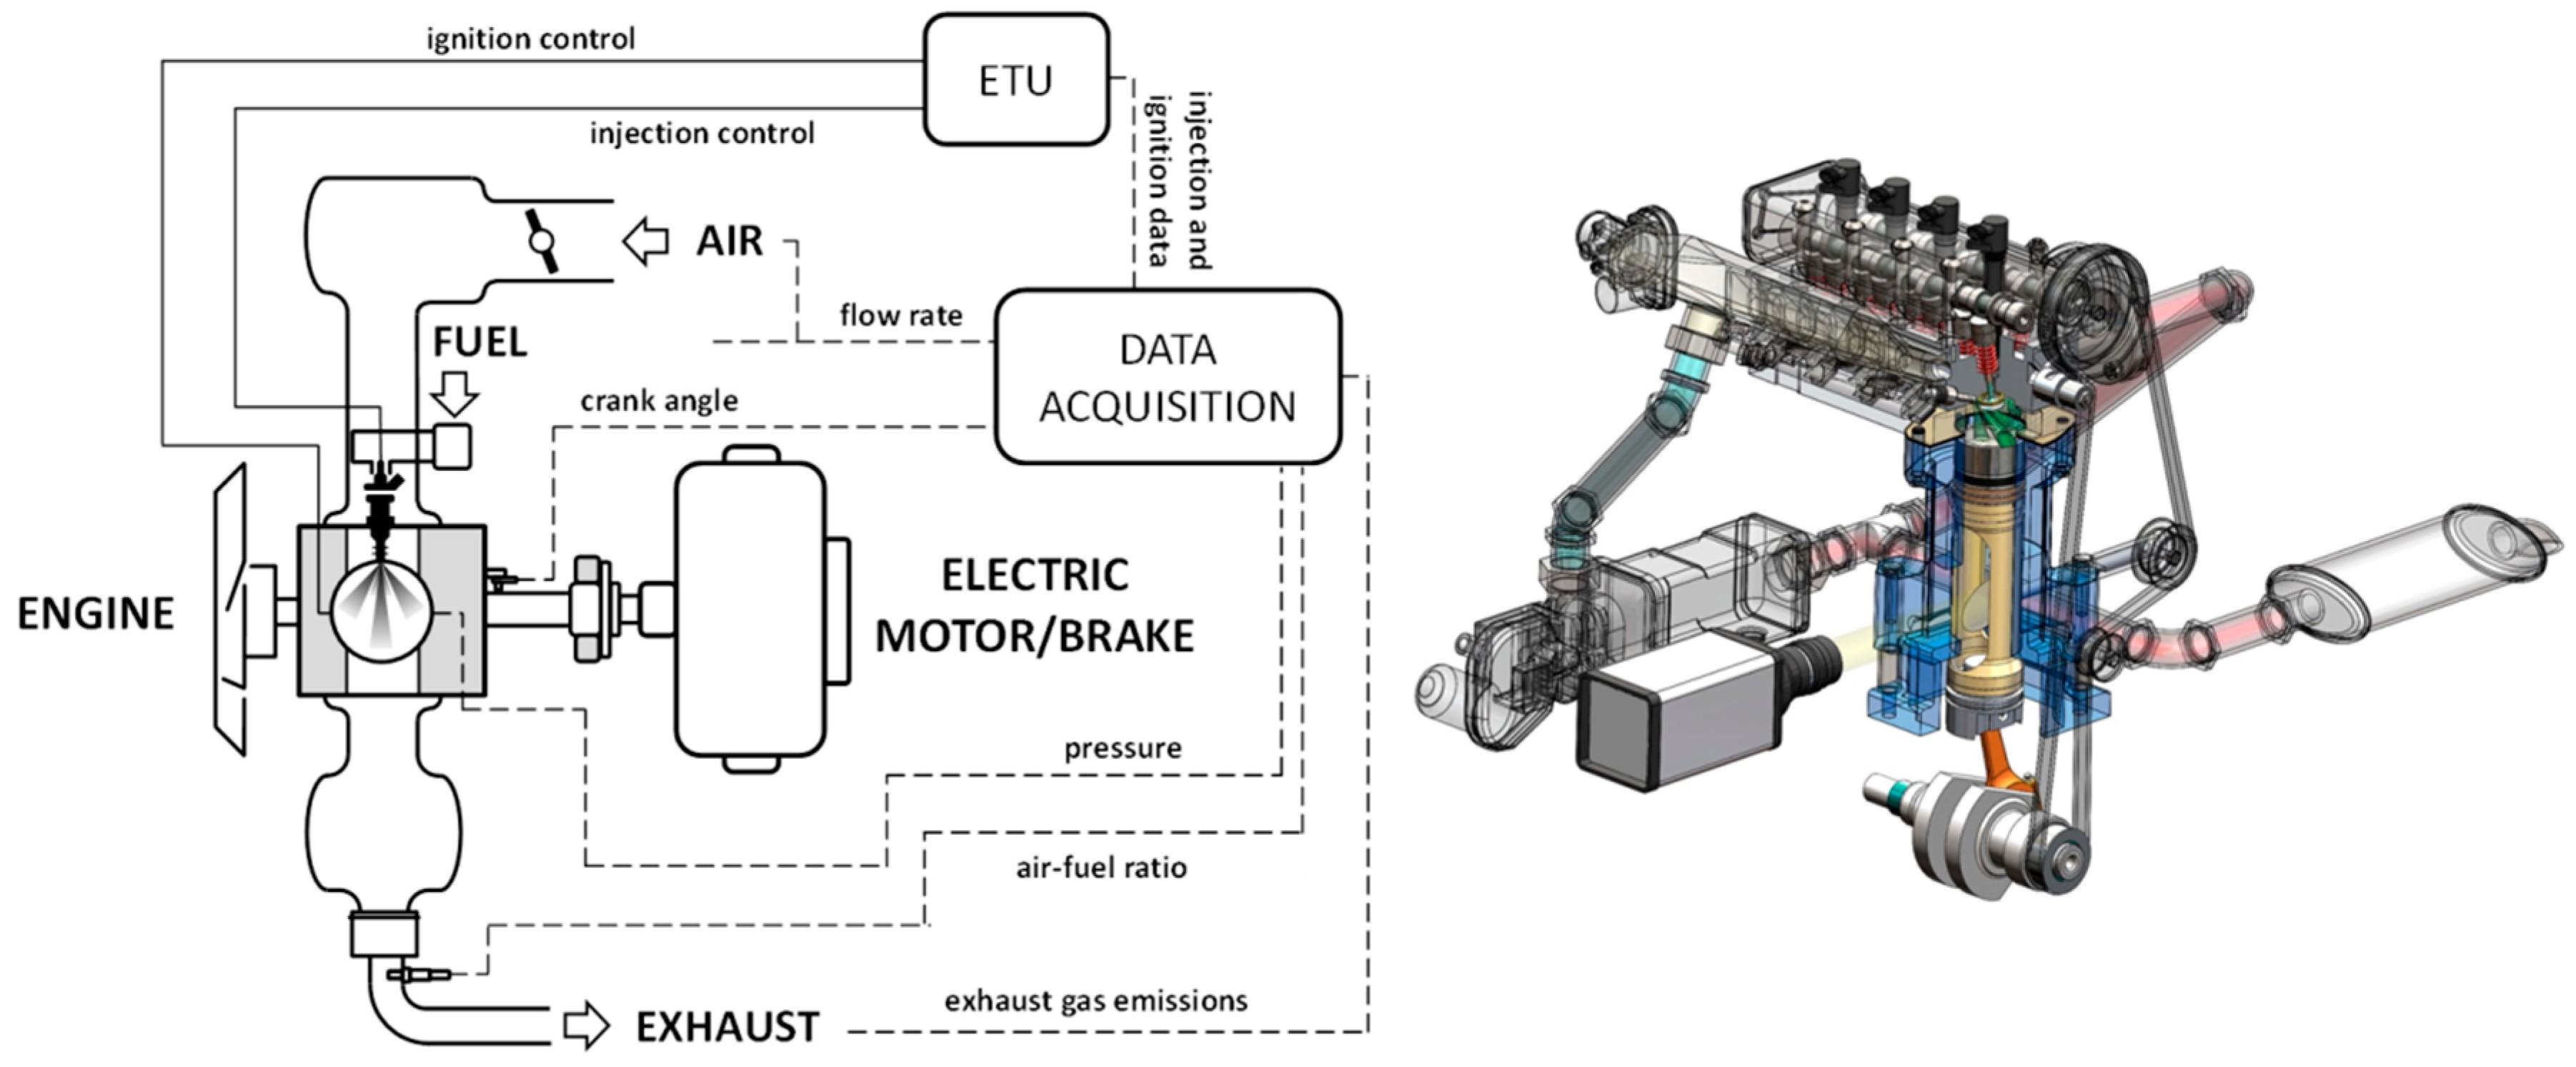 Car Engine Diagram Driving Test Energies Of Car Engine Diagram Driving Test